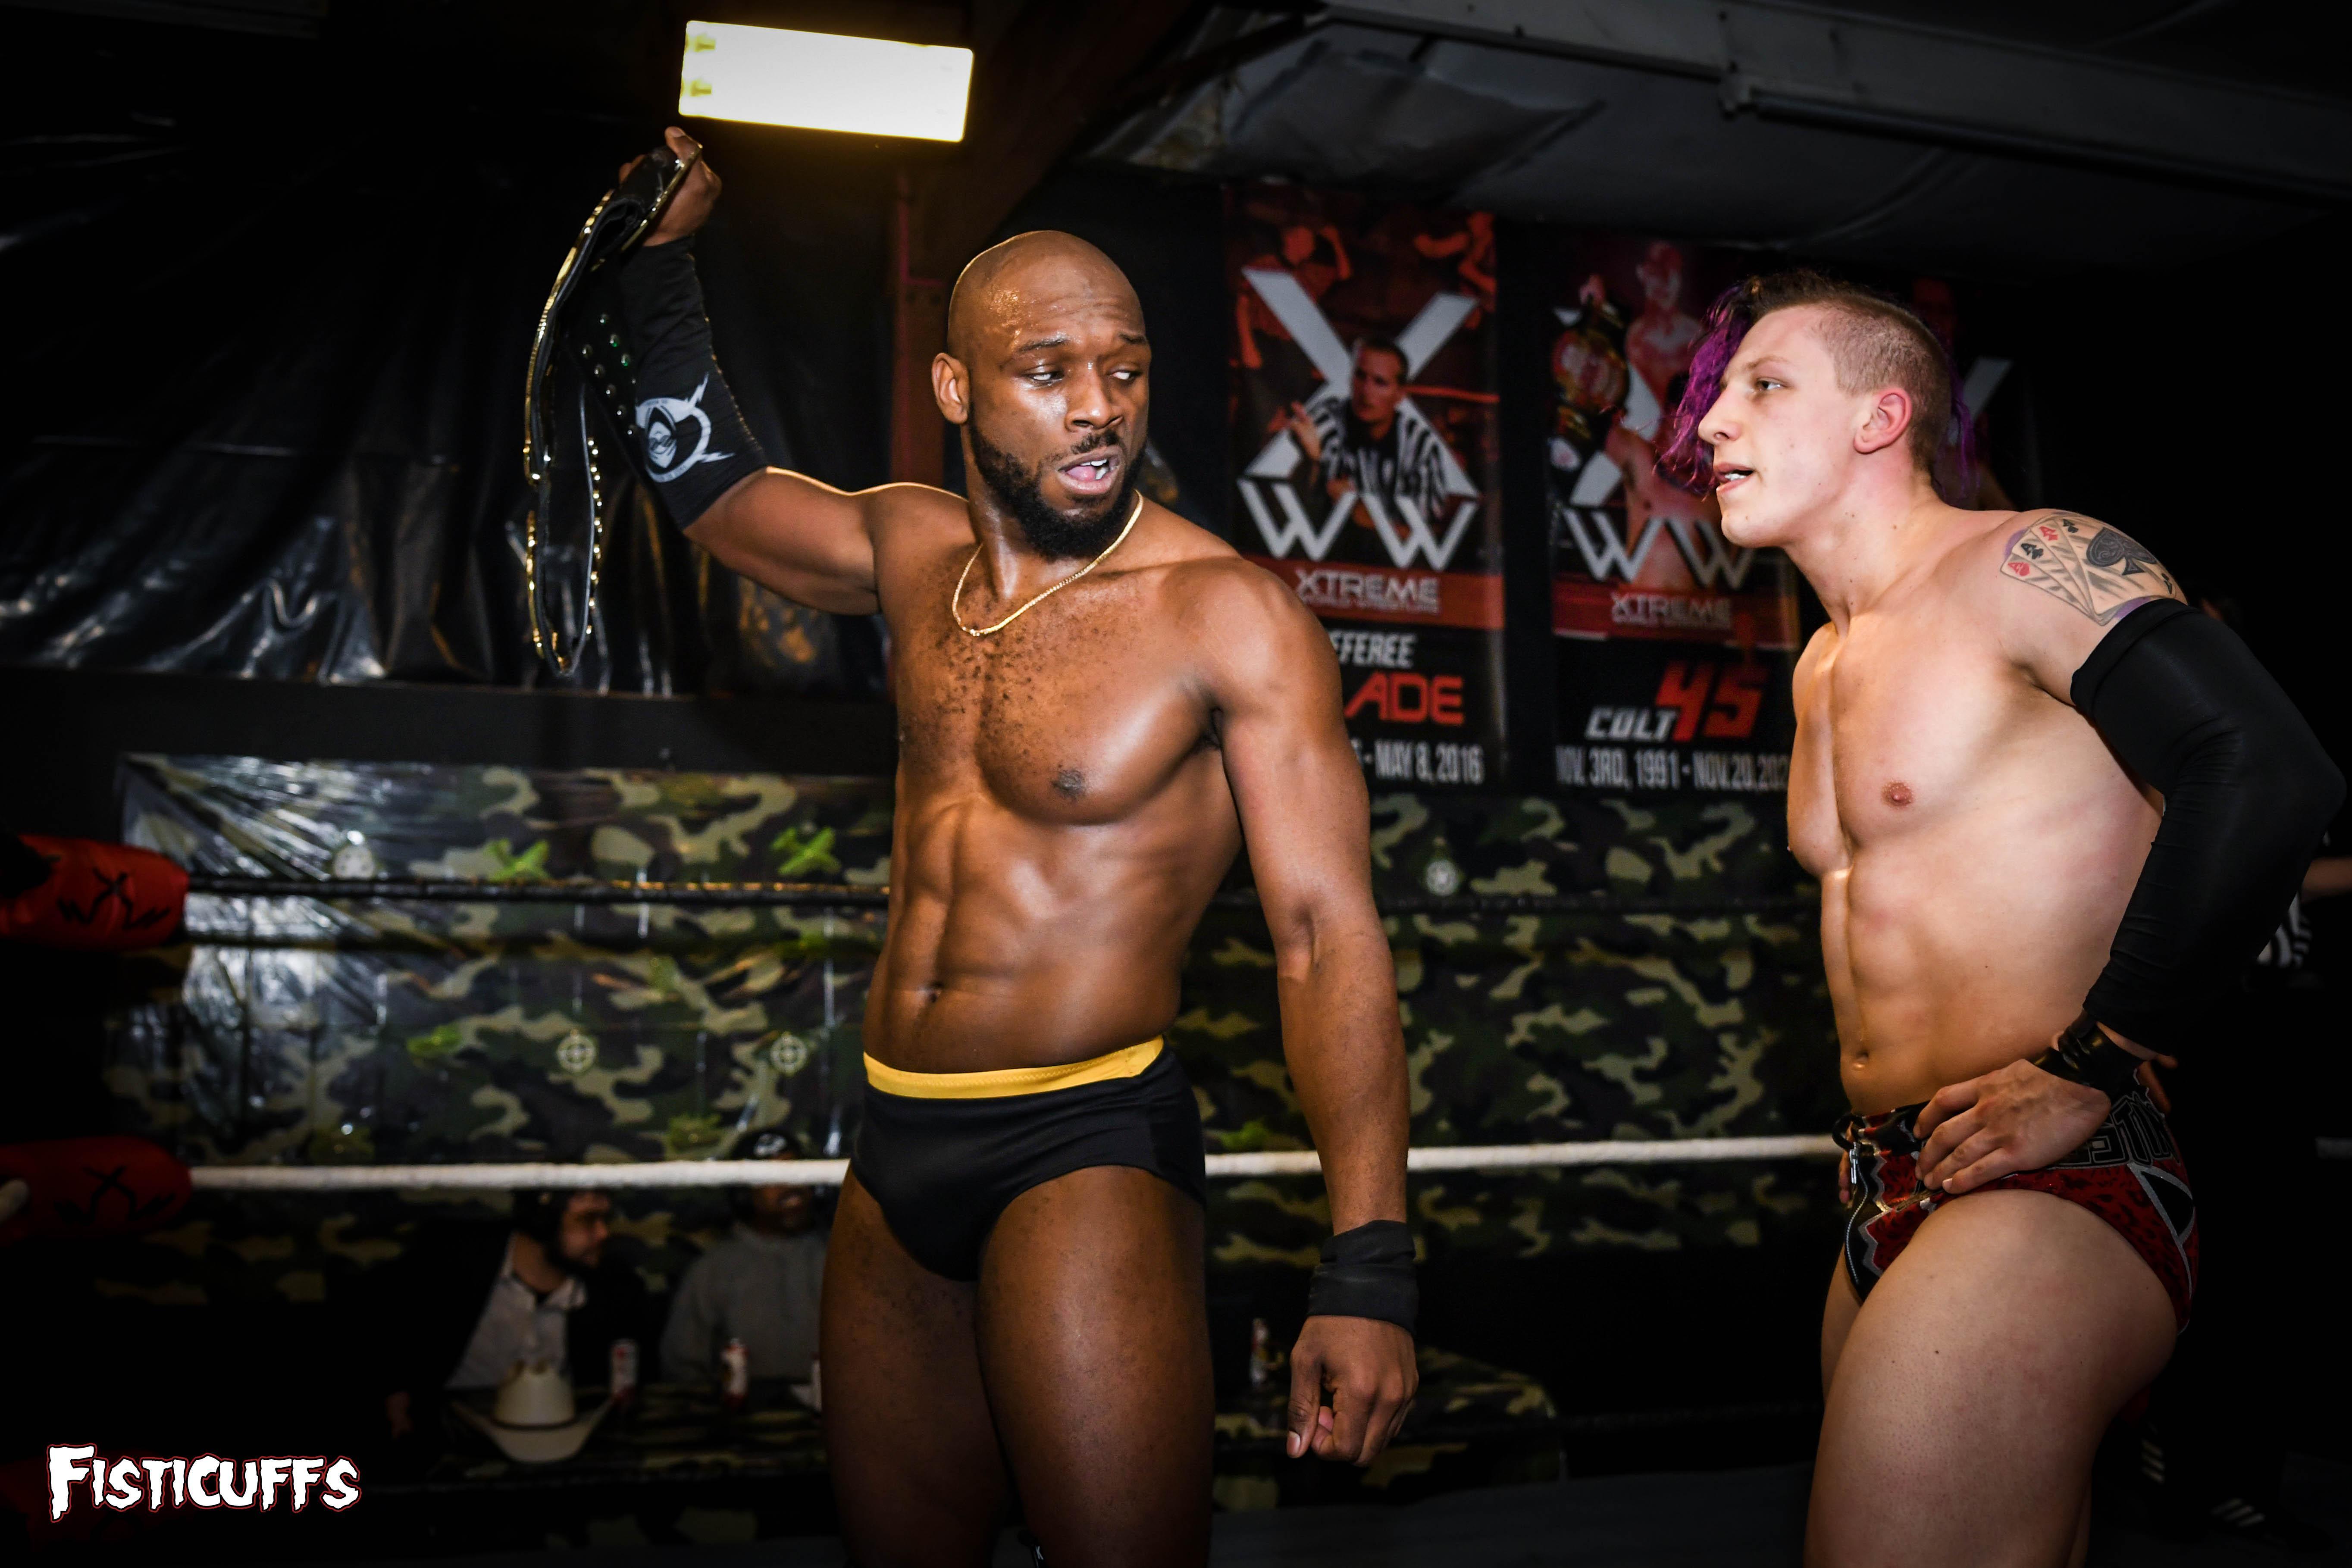 Xtreme World Wrestling Presents Xtreme Warfare